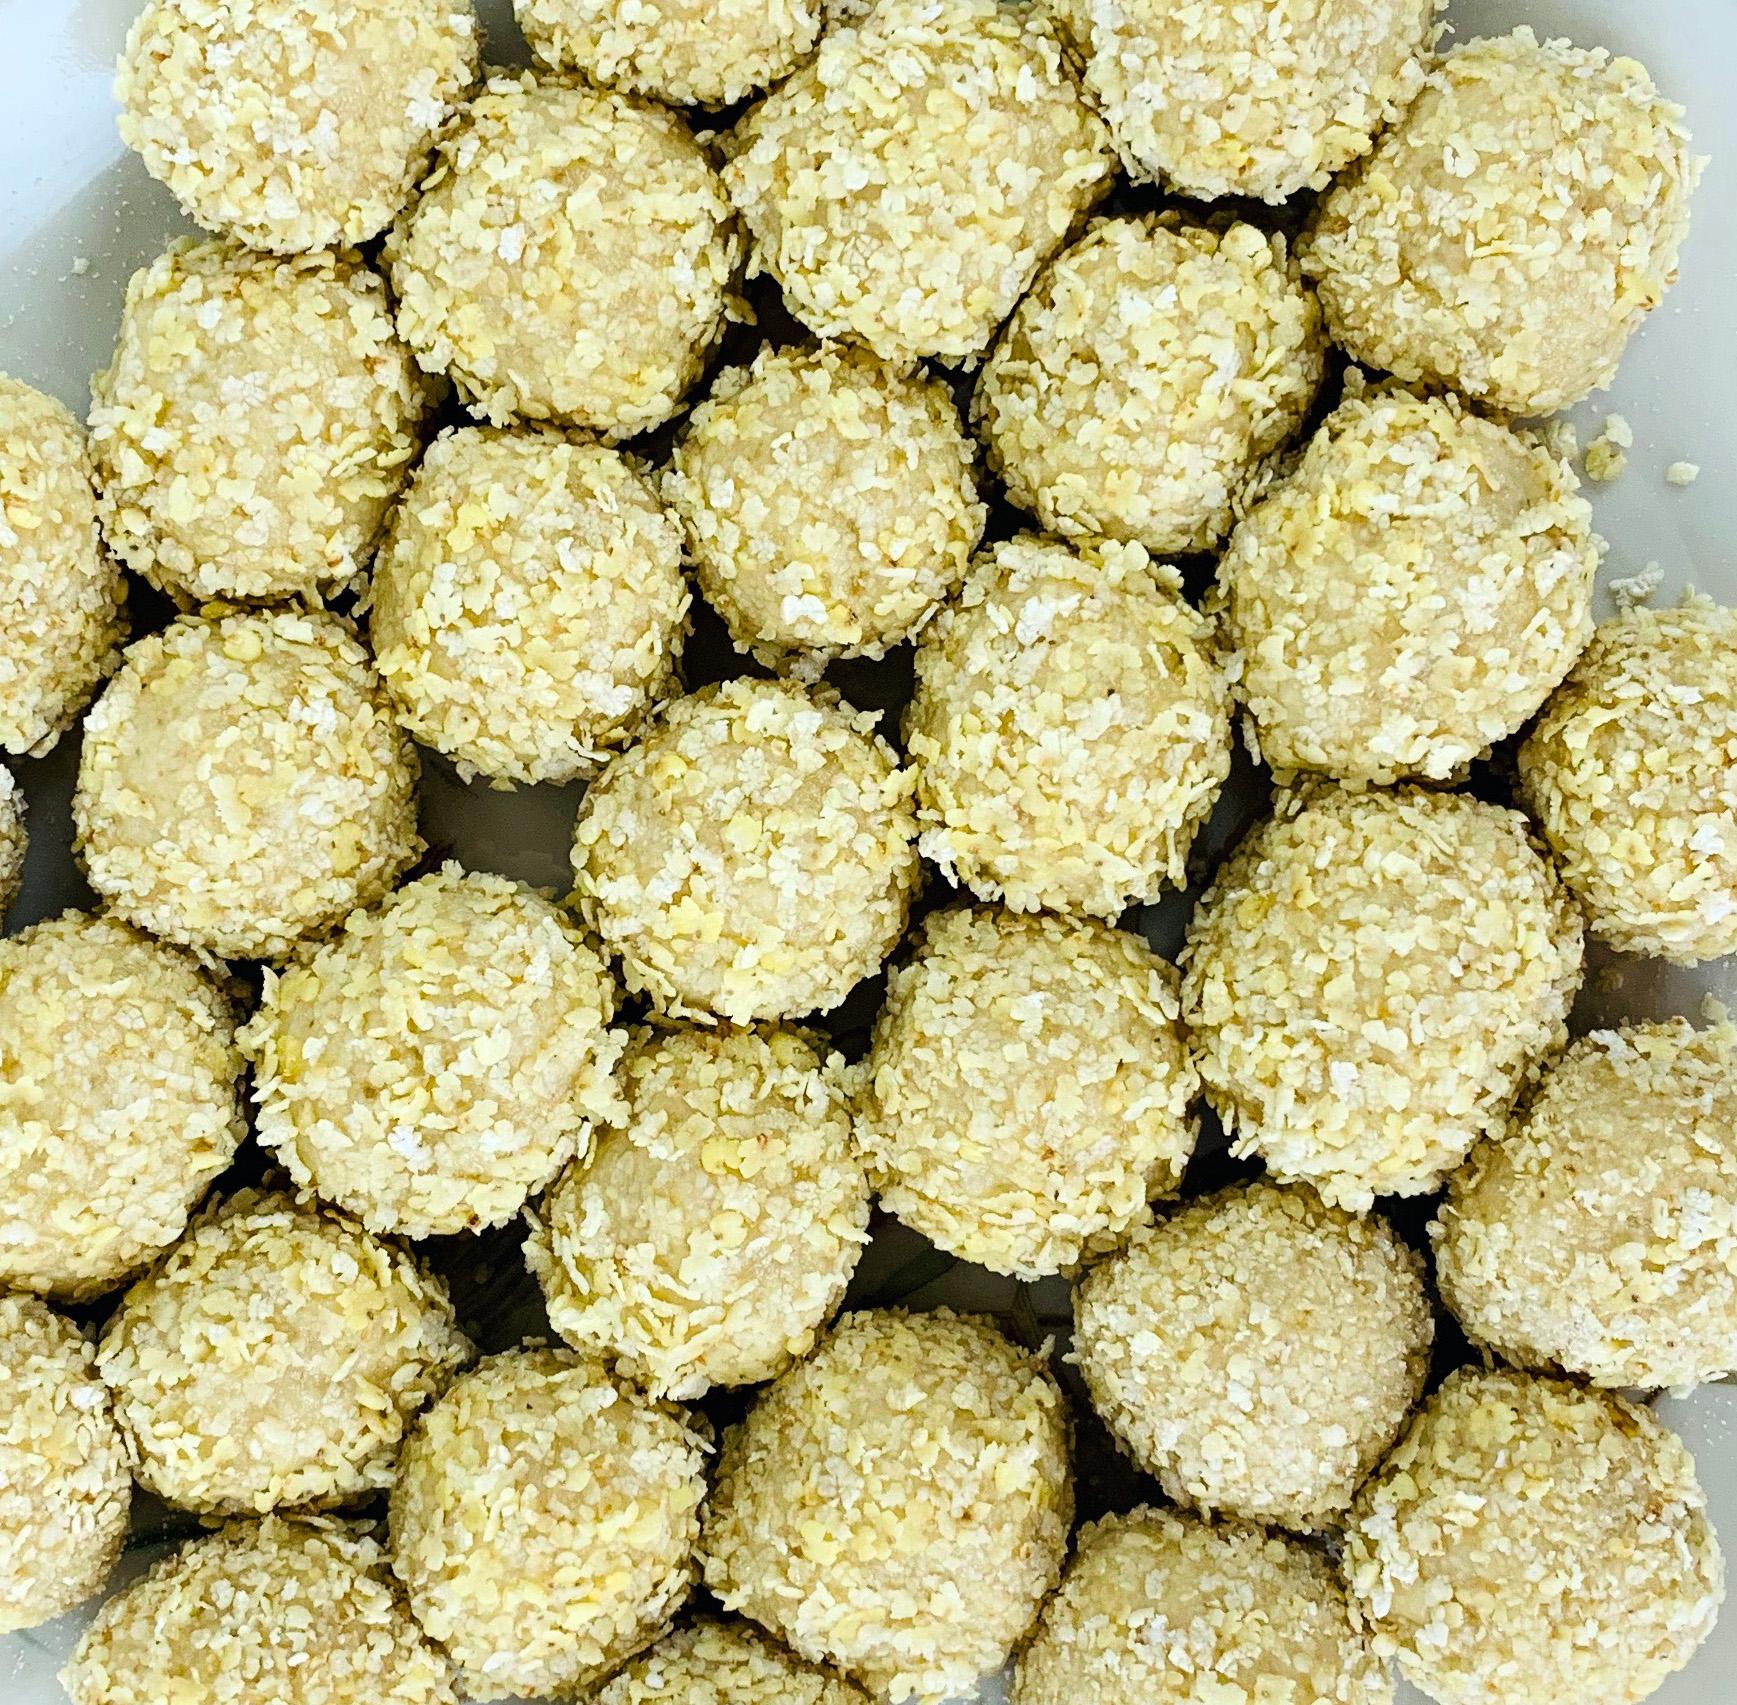 Cashew-Ingwer-Balls